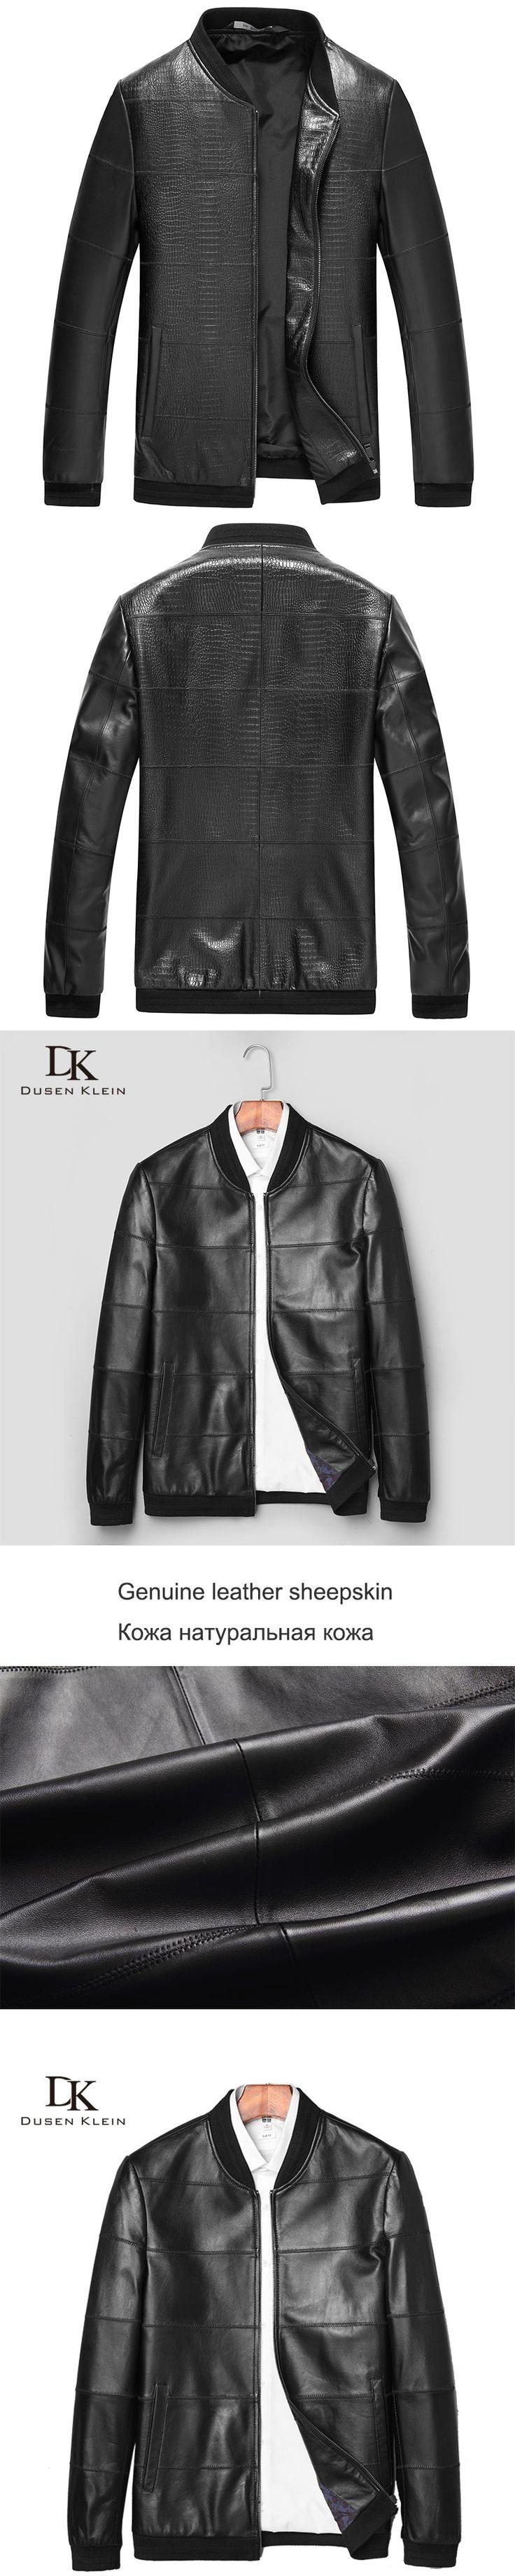 Crocodile pattern leather coats men Genuine sheepskin Dusen Klein Simple Slim/Fashion men leather coat and jacket black J1690A